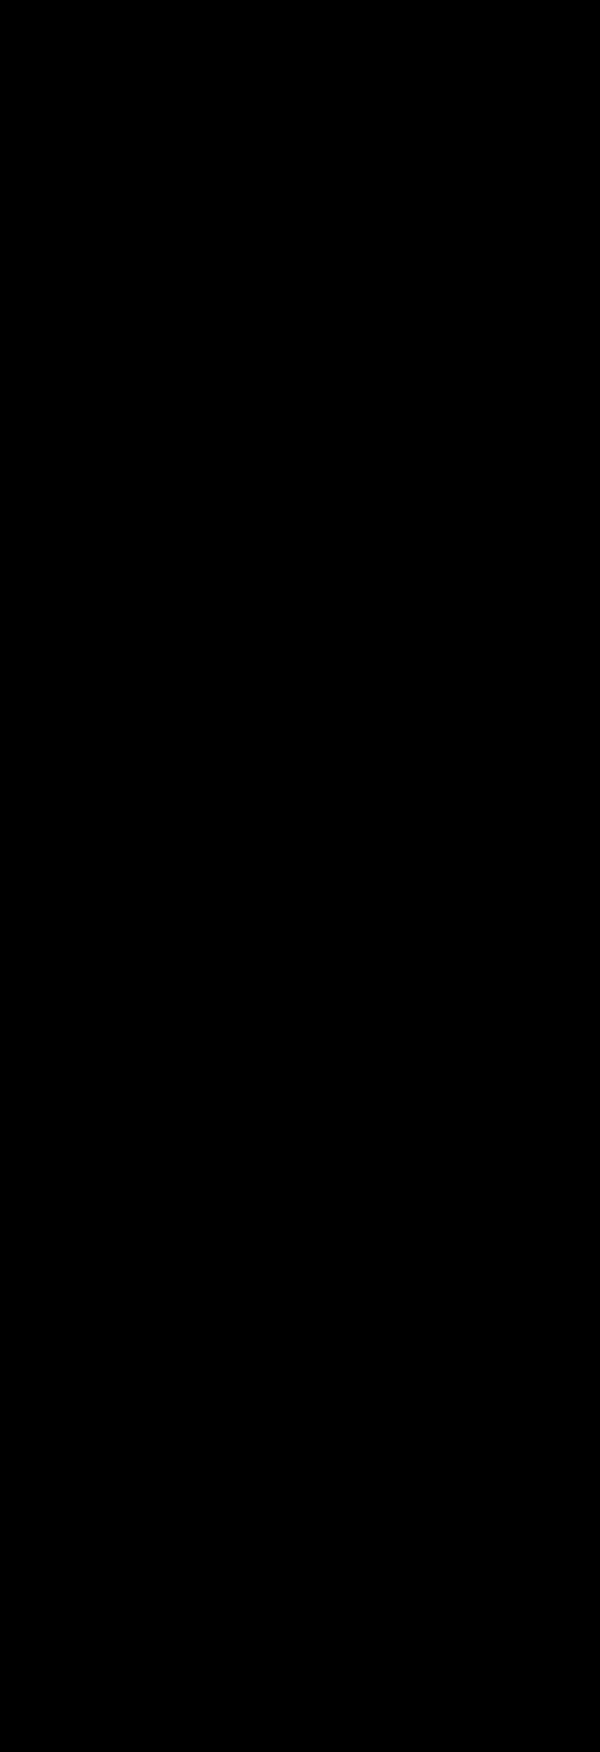 Man standing panda free. Clipart shirt silhouette